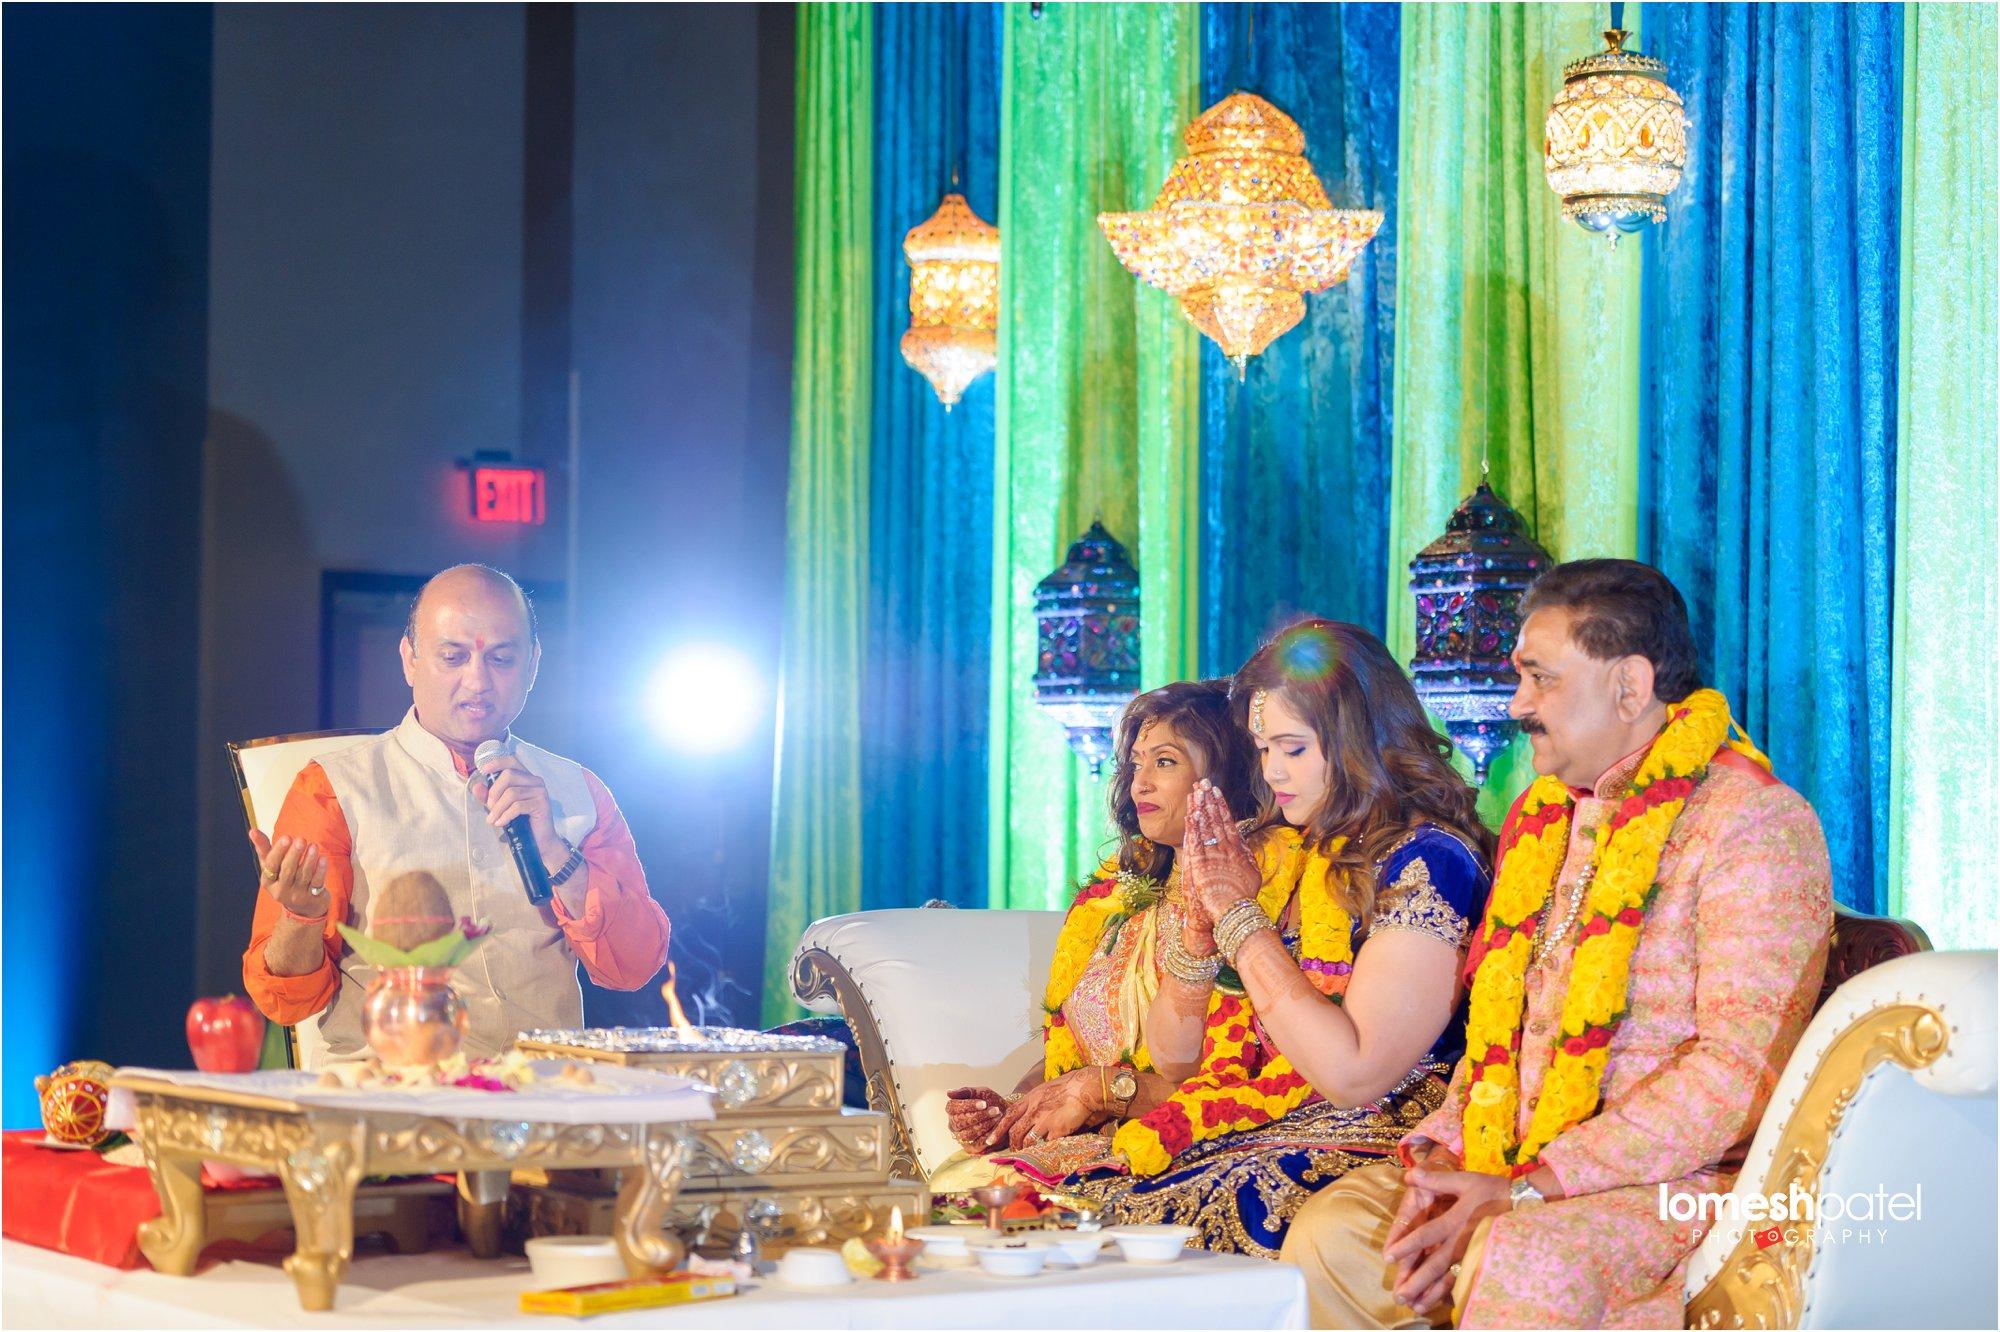 dallas_indian_wedding_0049.jpg